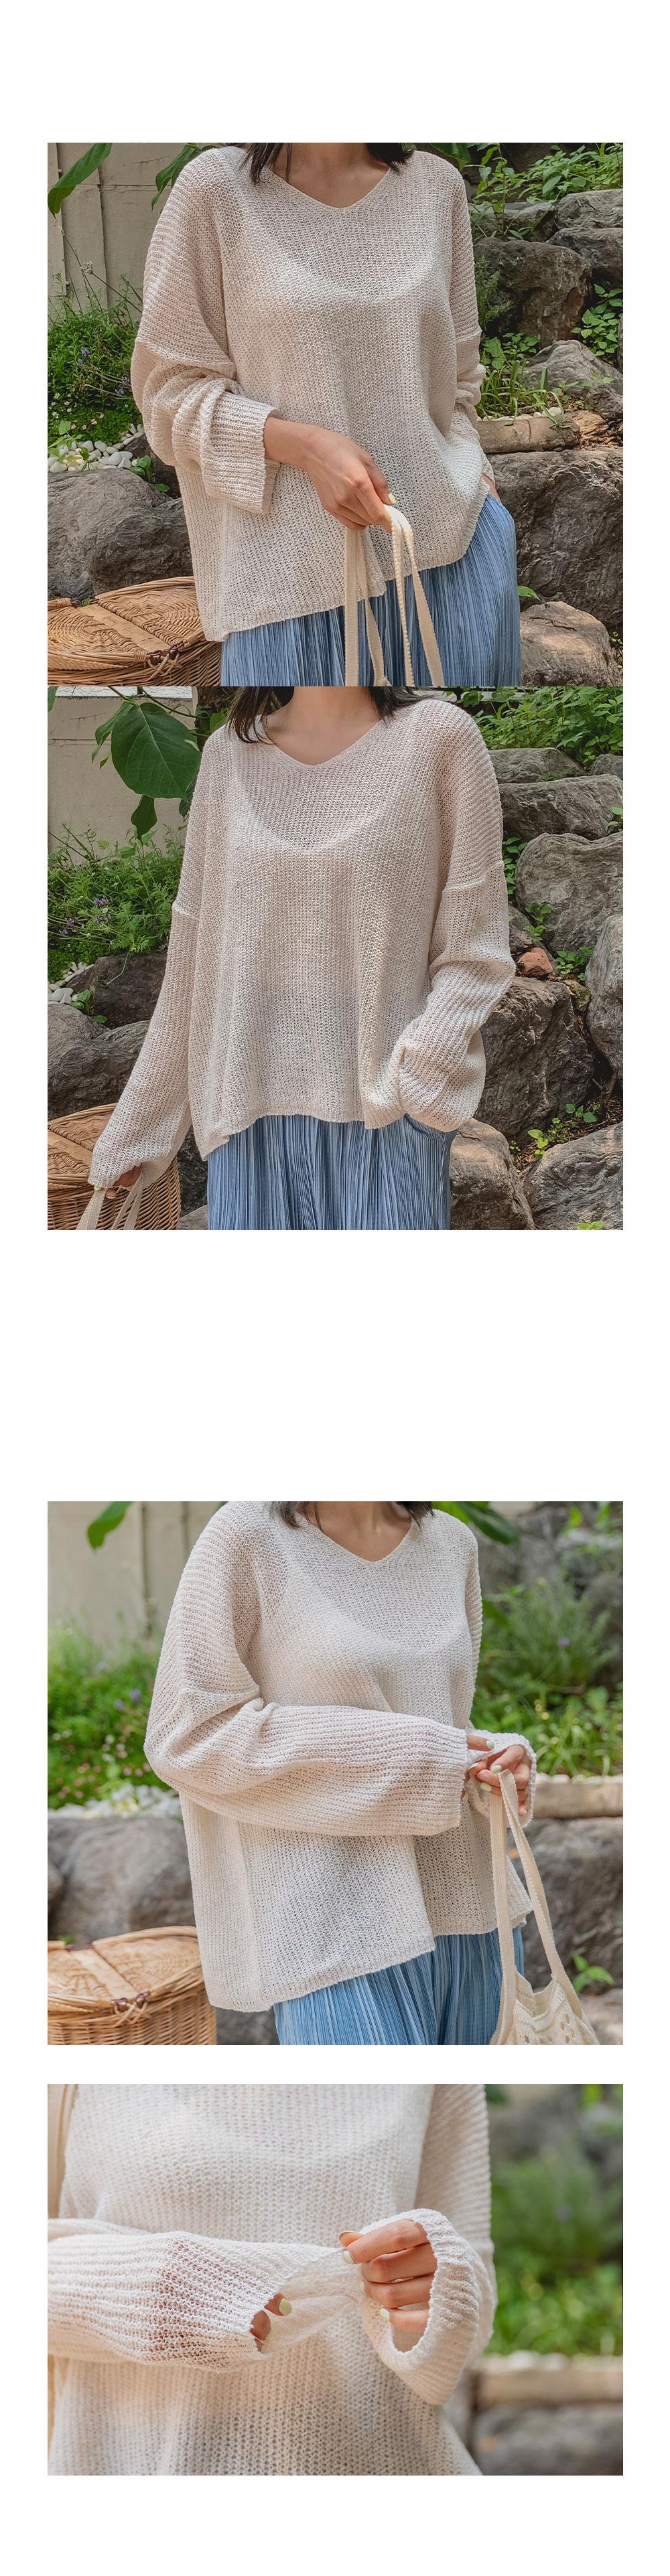 Summer Bookle Linen V-Neck Knitwear